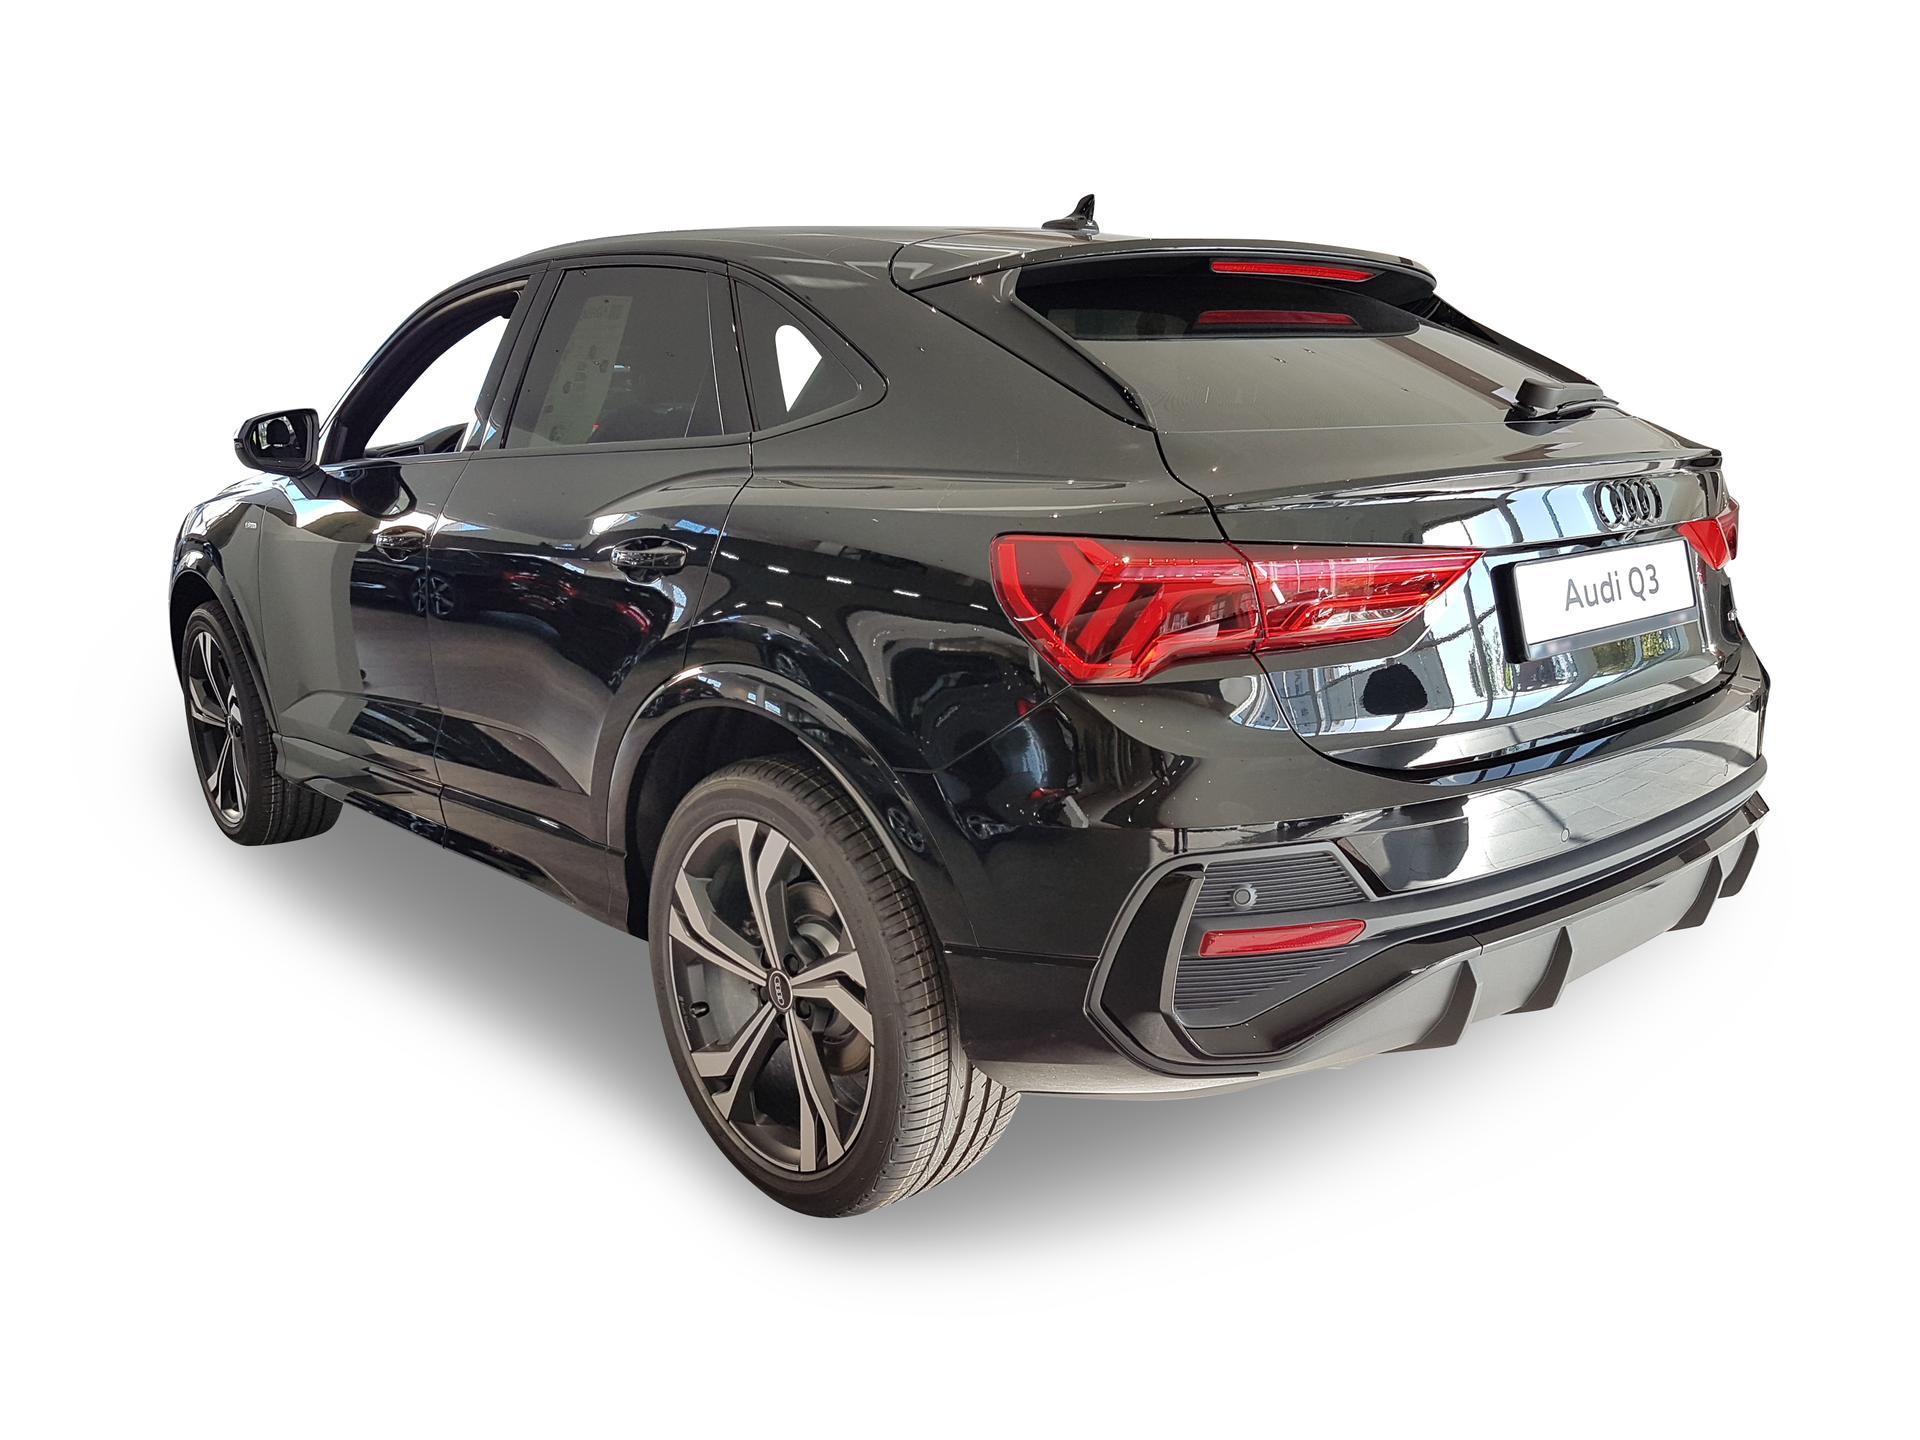 Audi / Q3 Sportback / EU-Neuwagen / Reimport